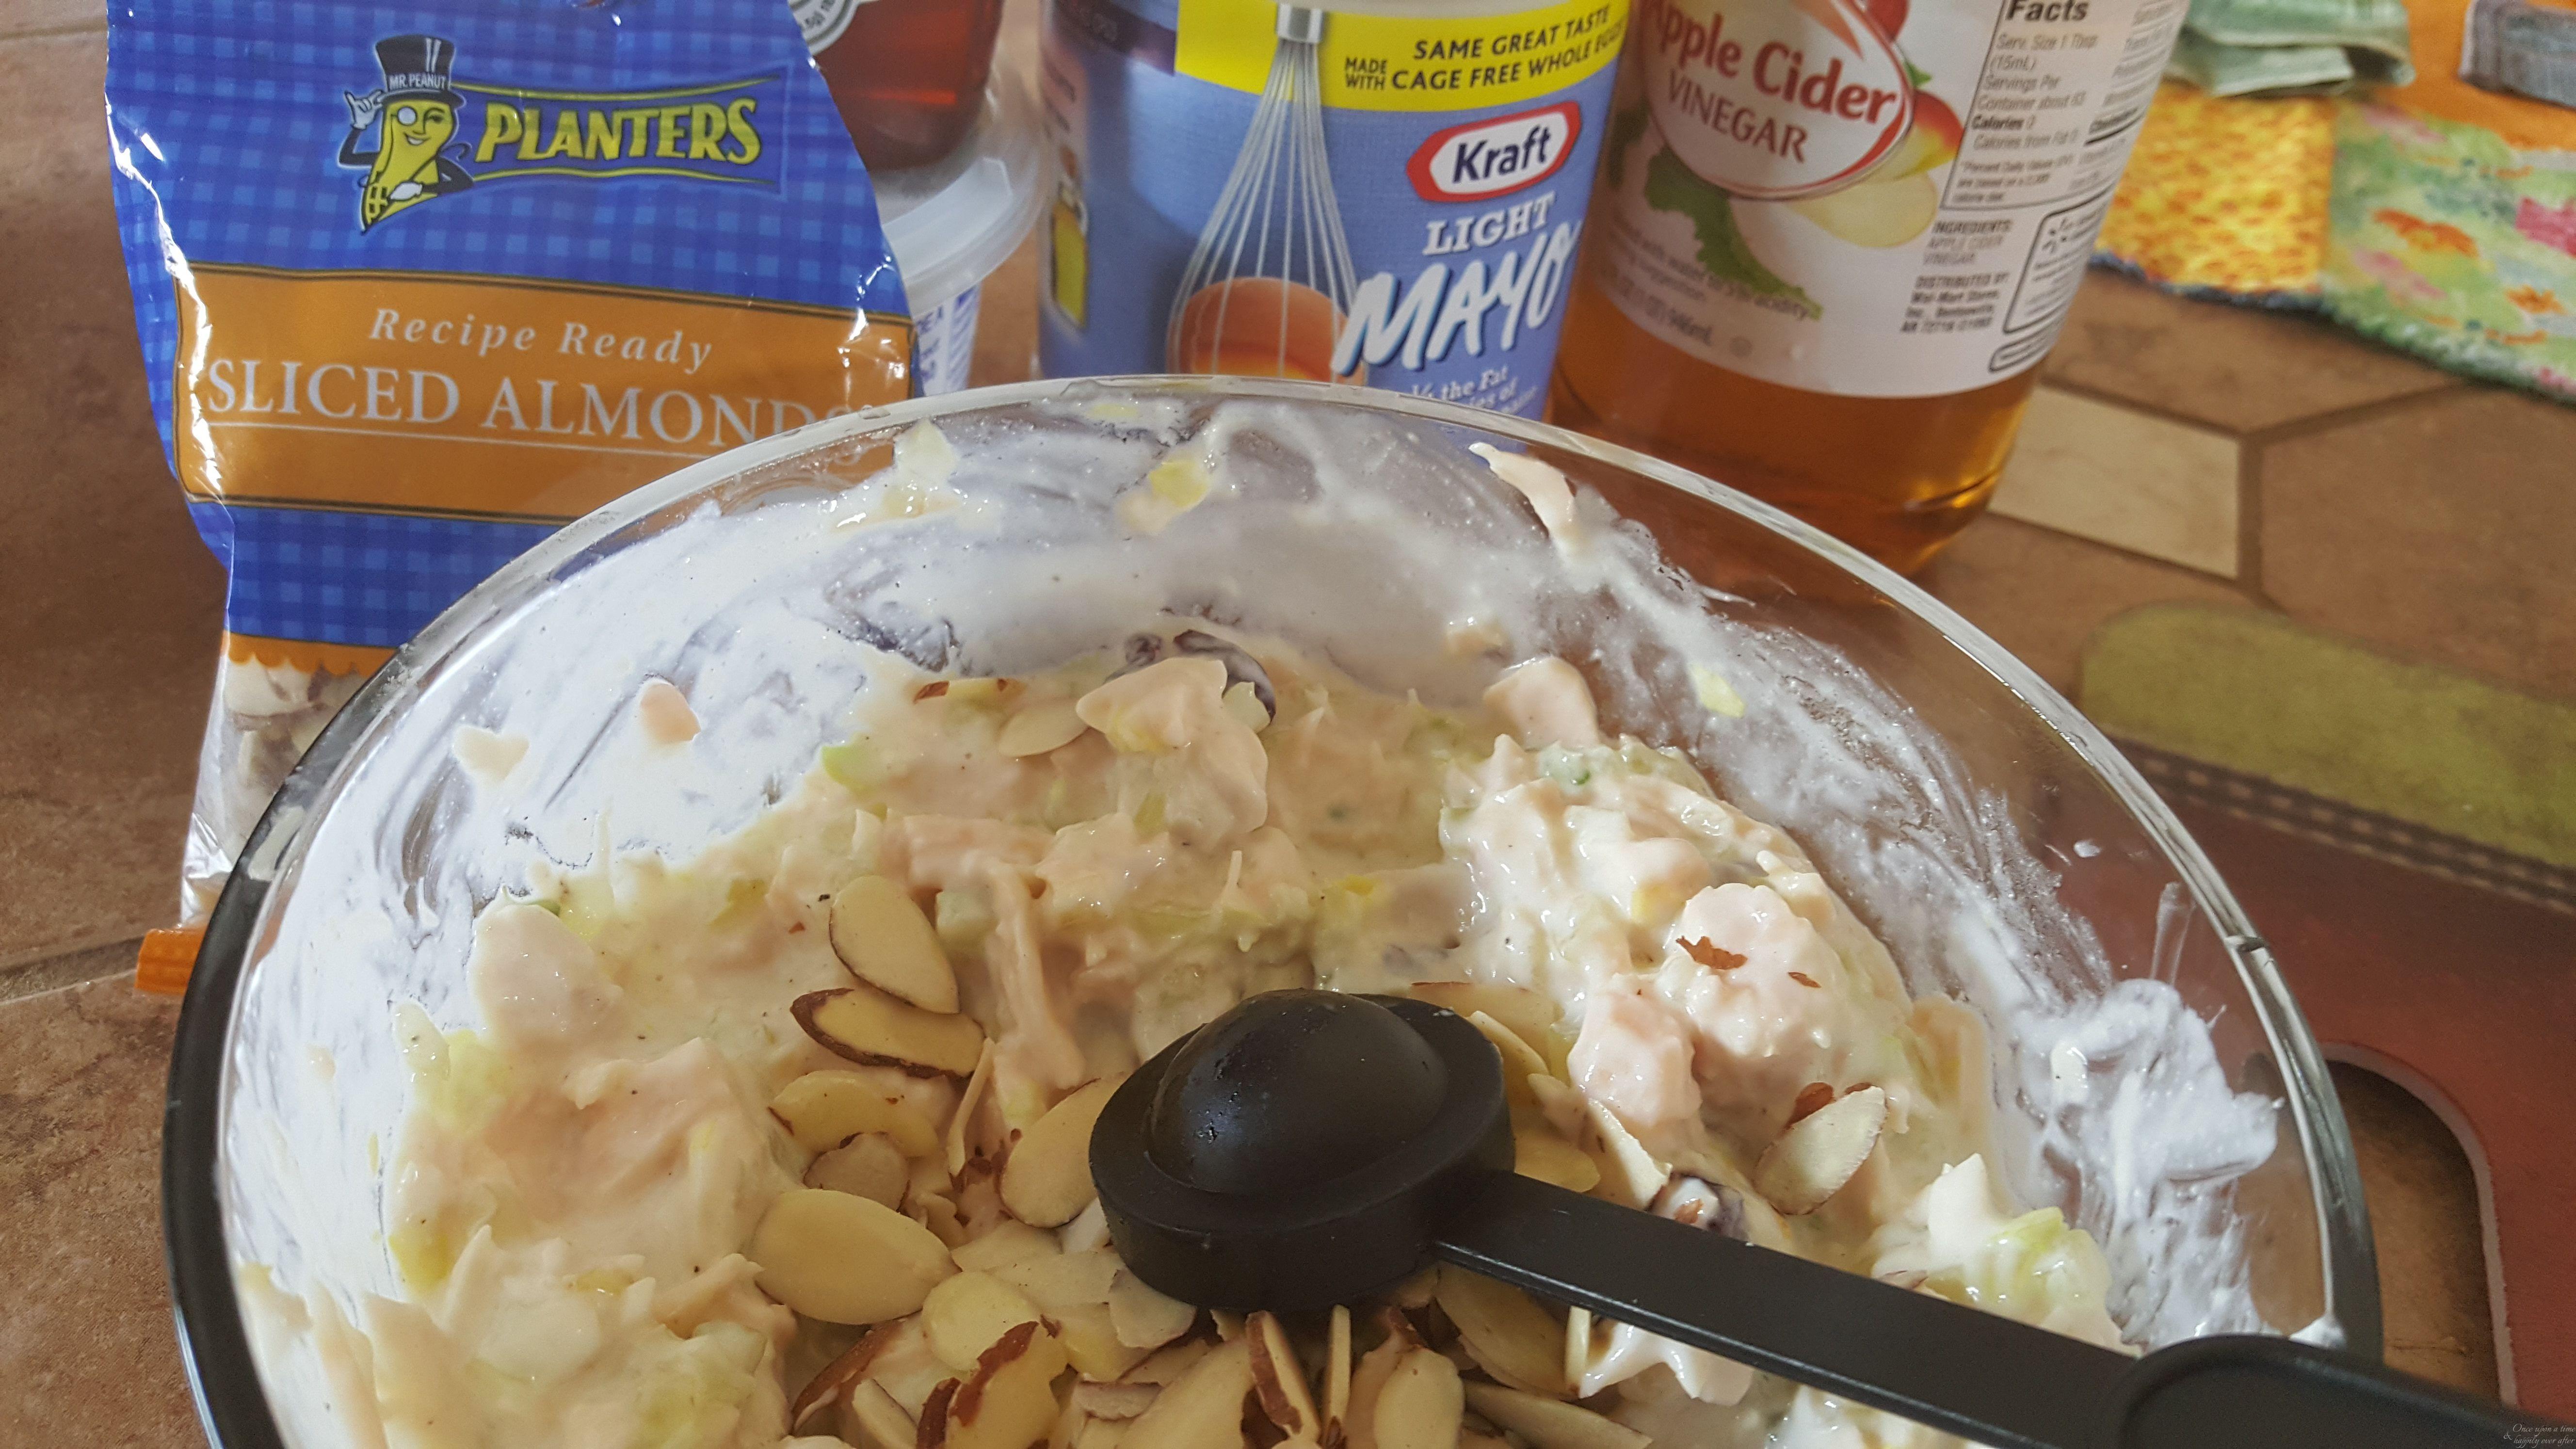 Tasty Tuesday: Skinny Chicken Salad